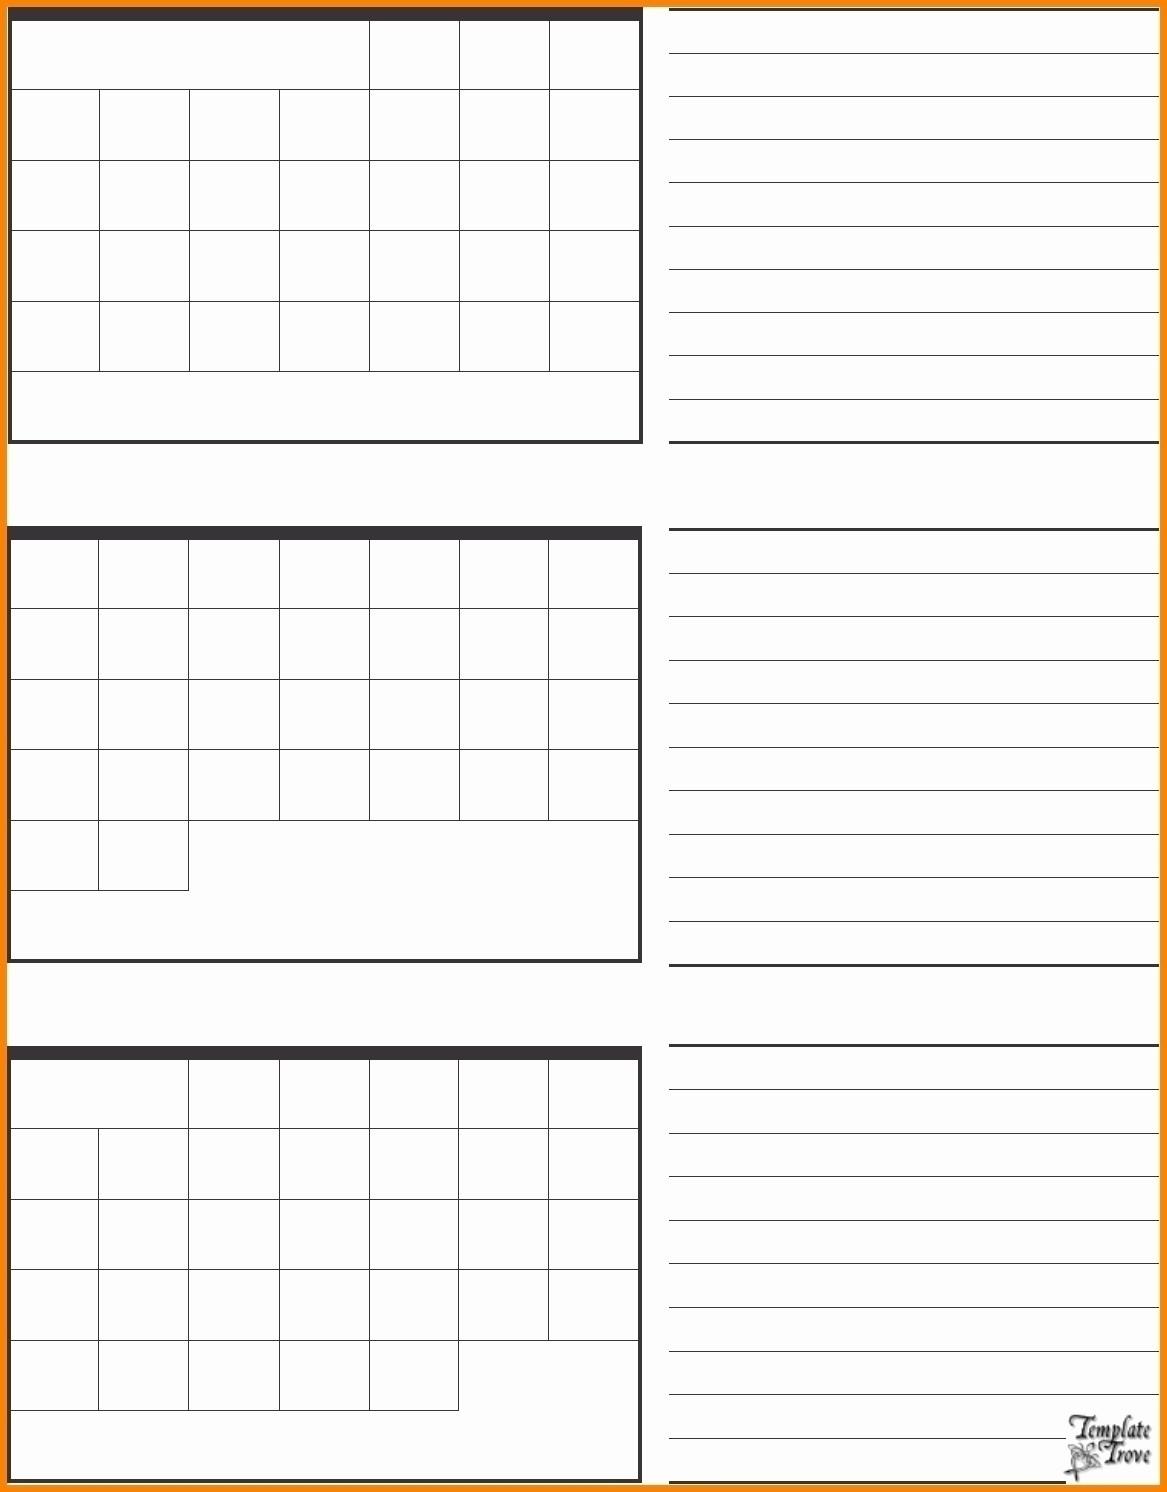 3 Month Blank Printable Calendar | Example Calendar-3 Month Blank Printable